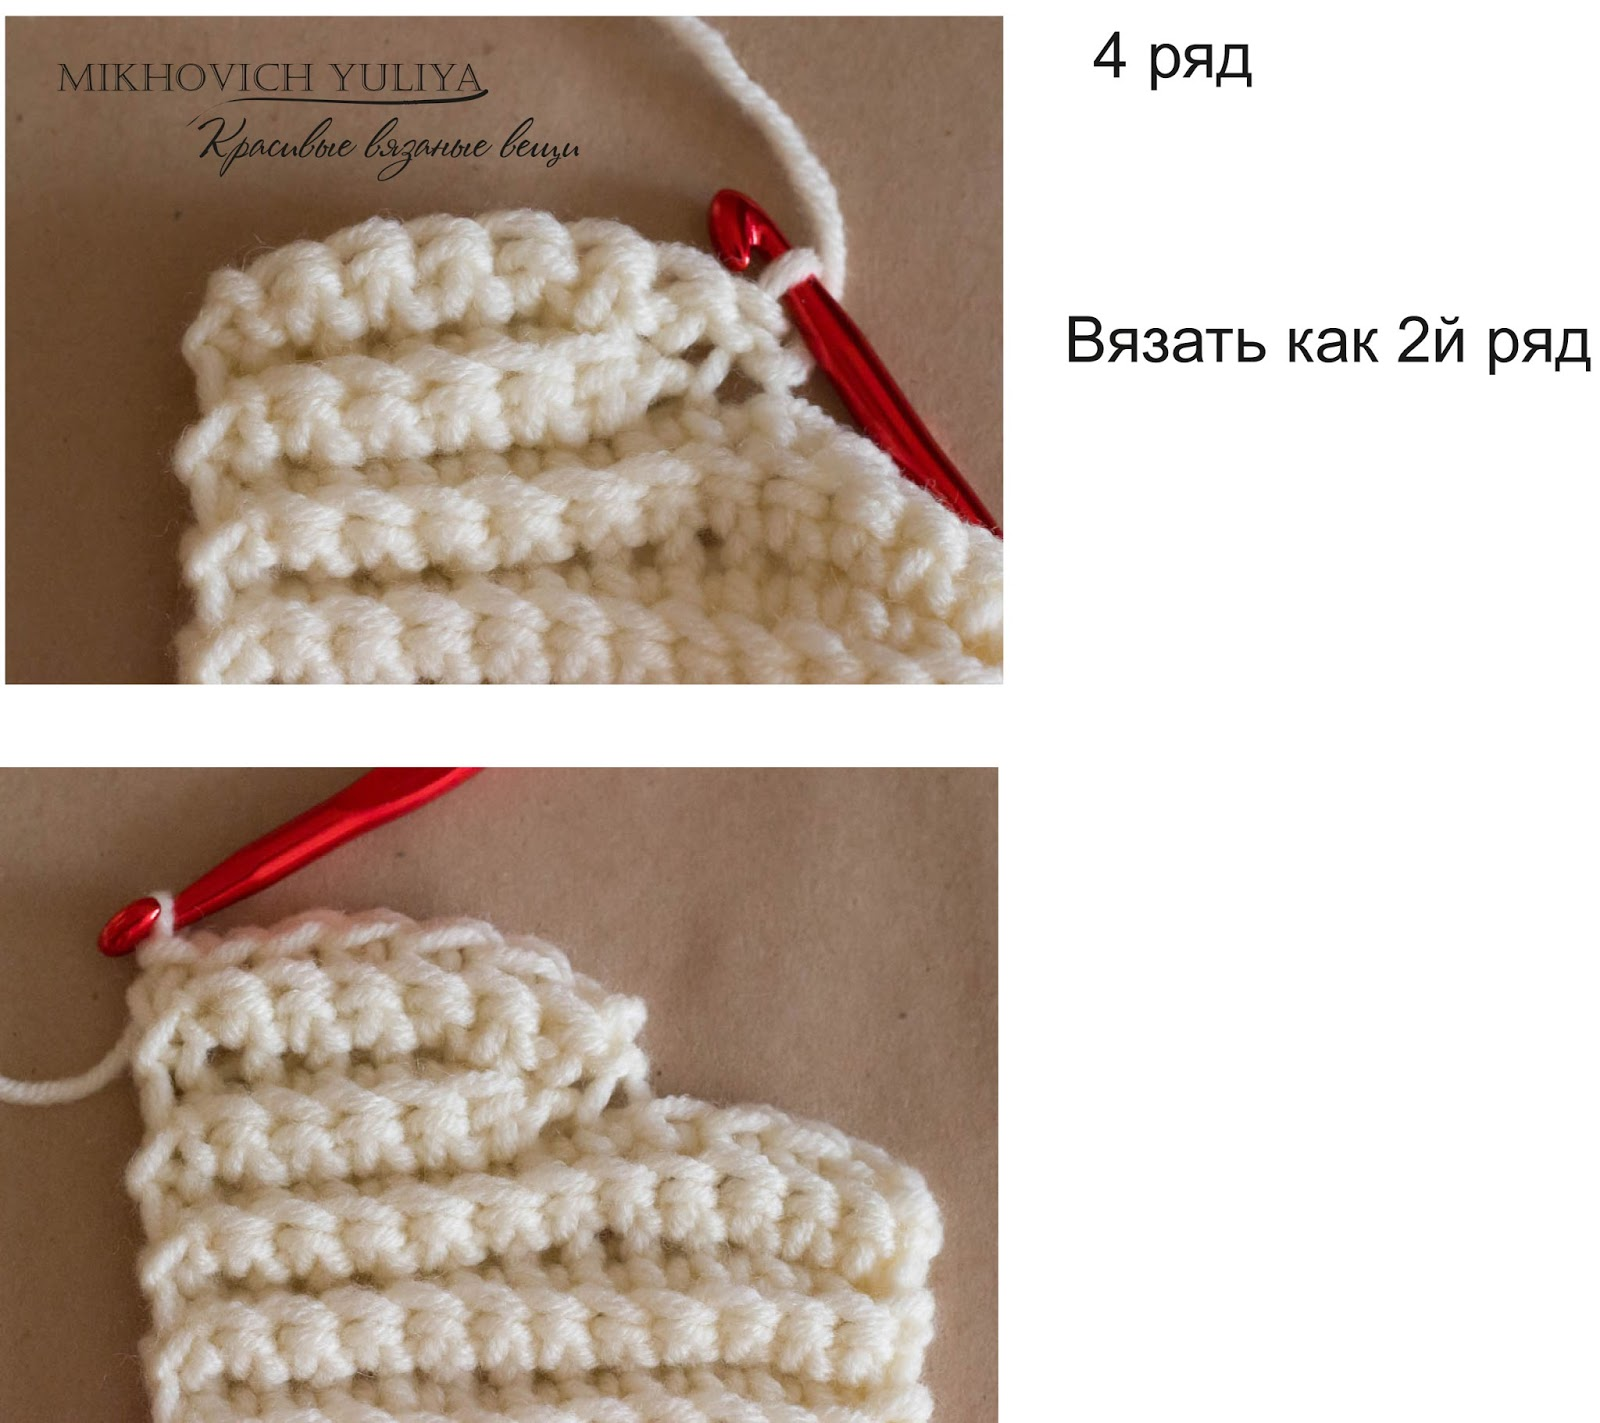 Полина куц мастер классы вязание крючком